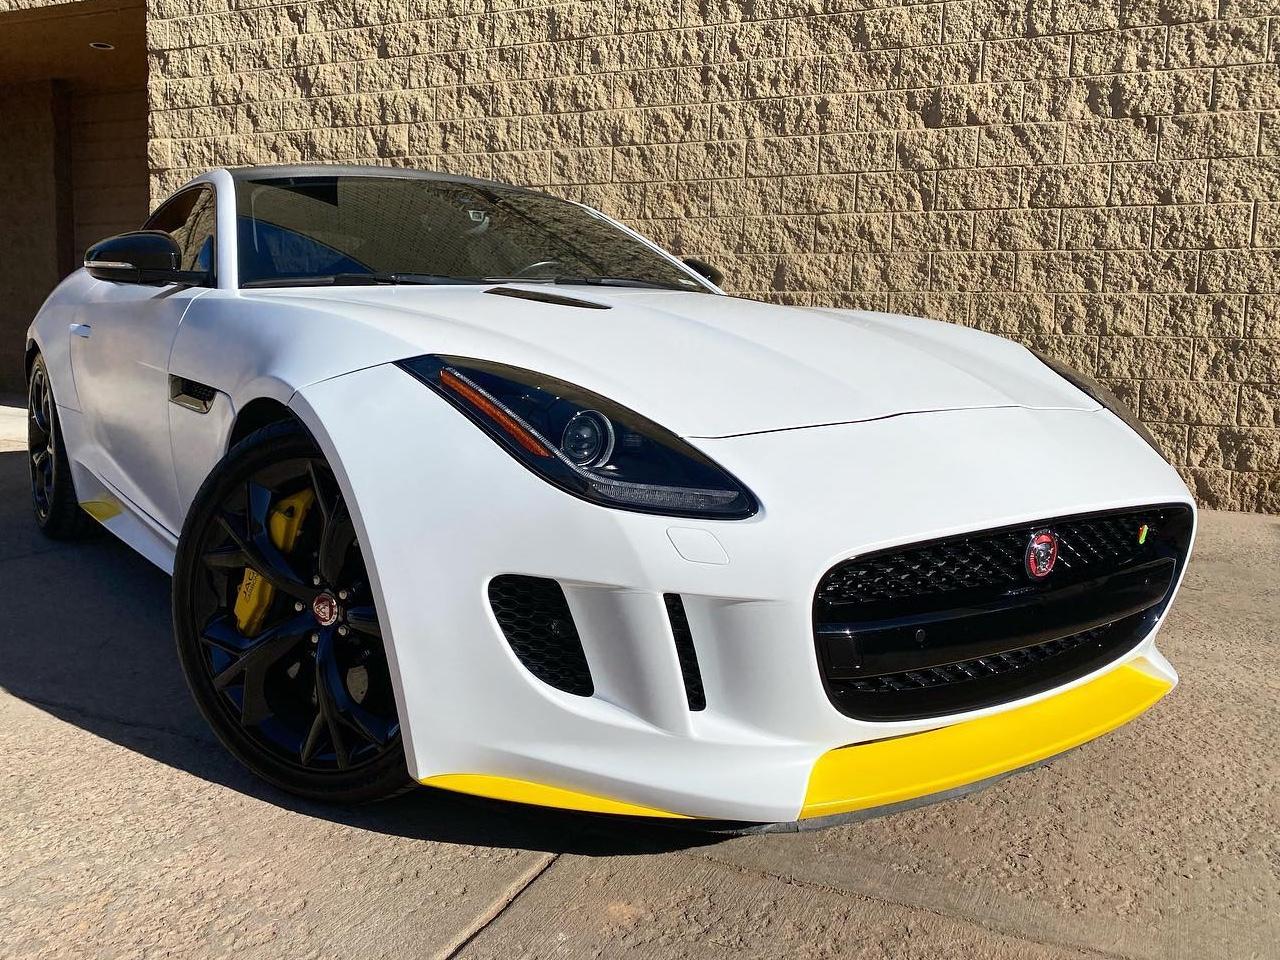 Jaguar F-TYPE window tinting front view